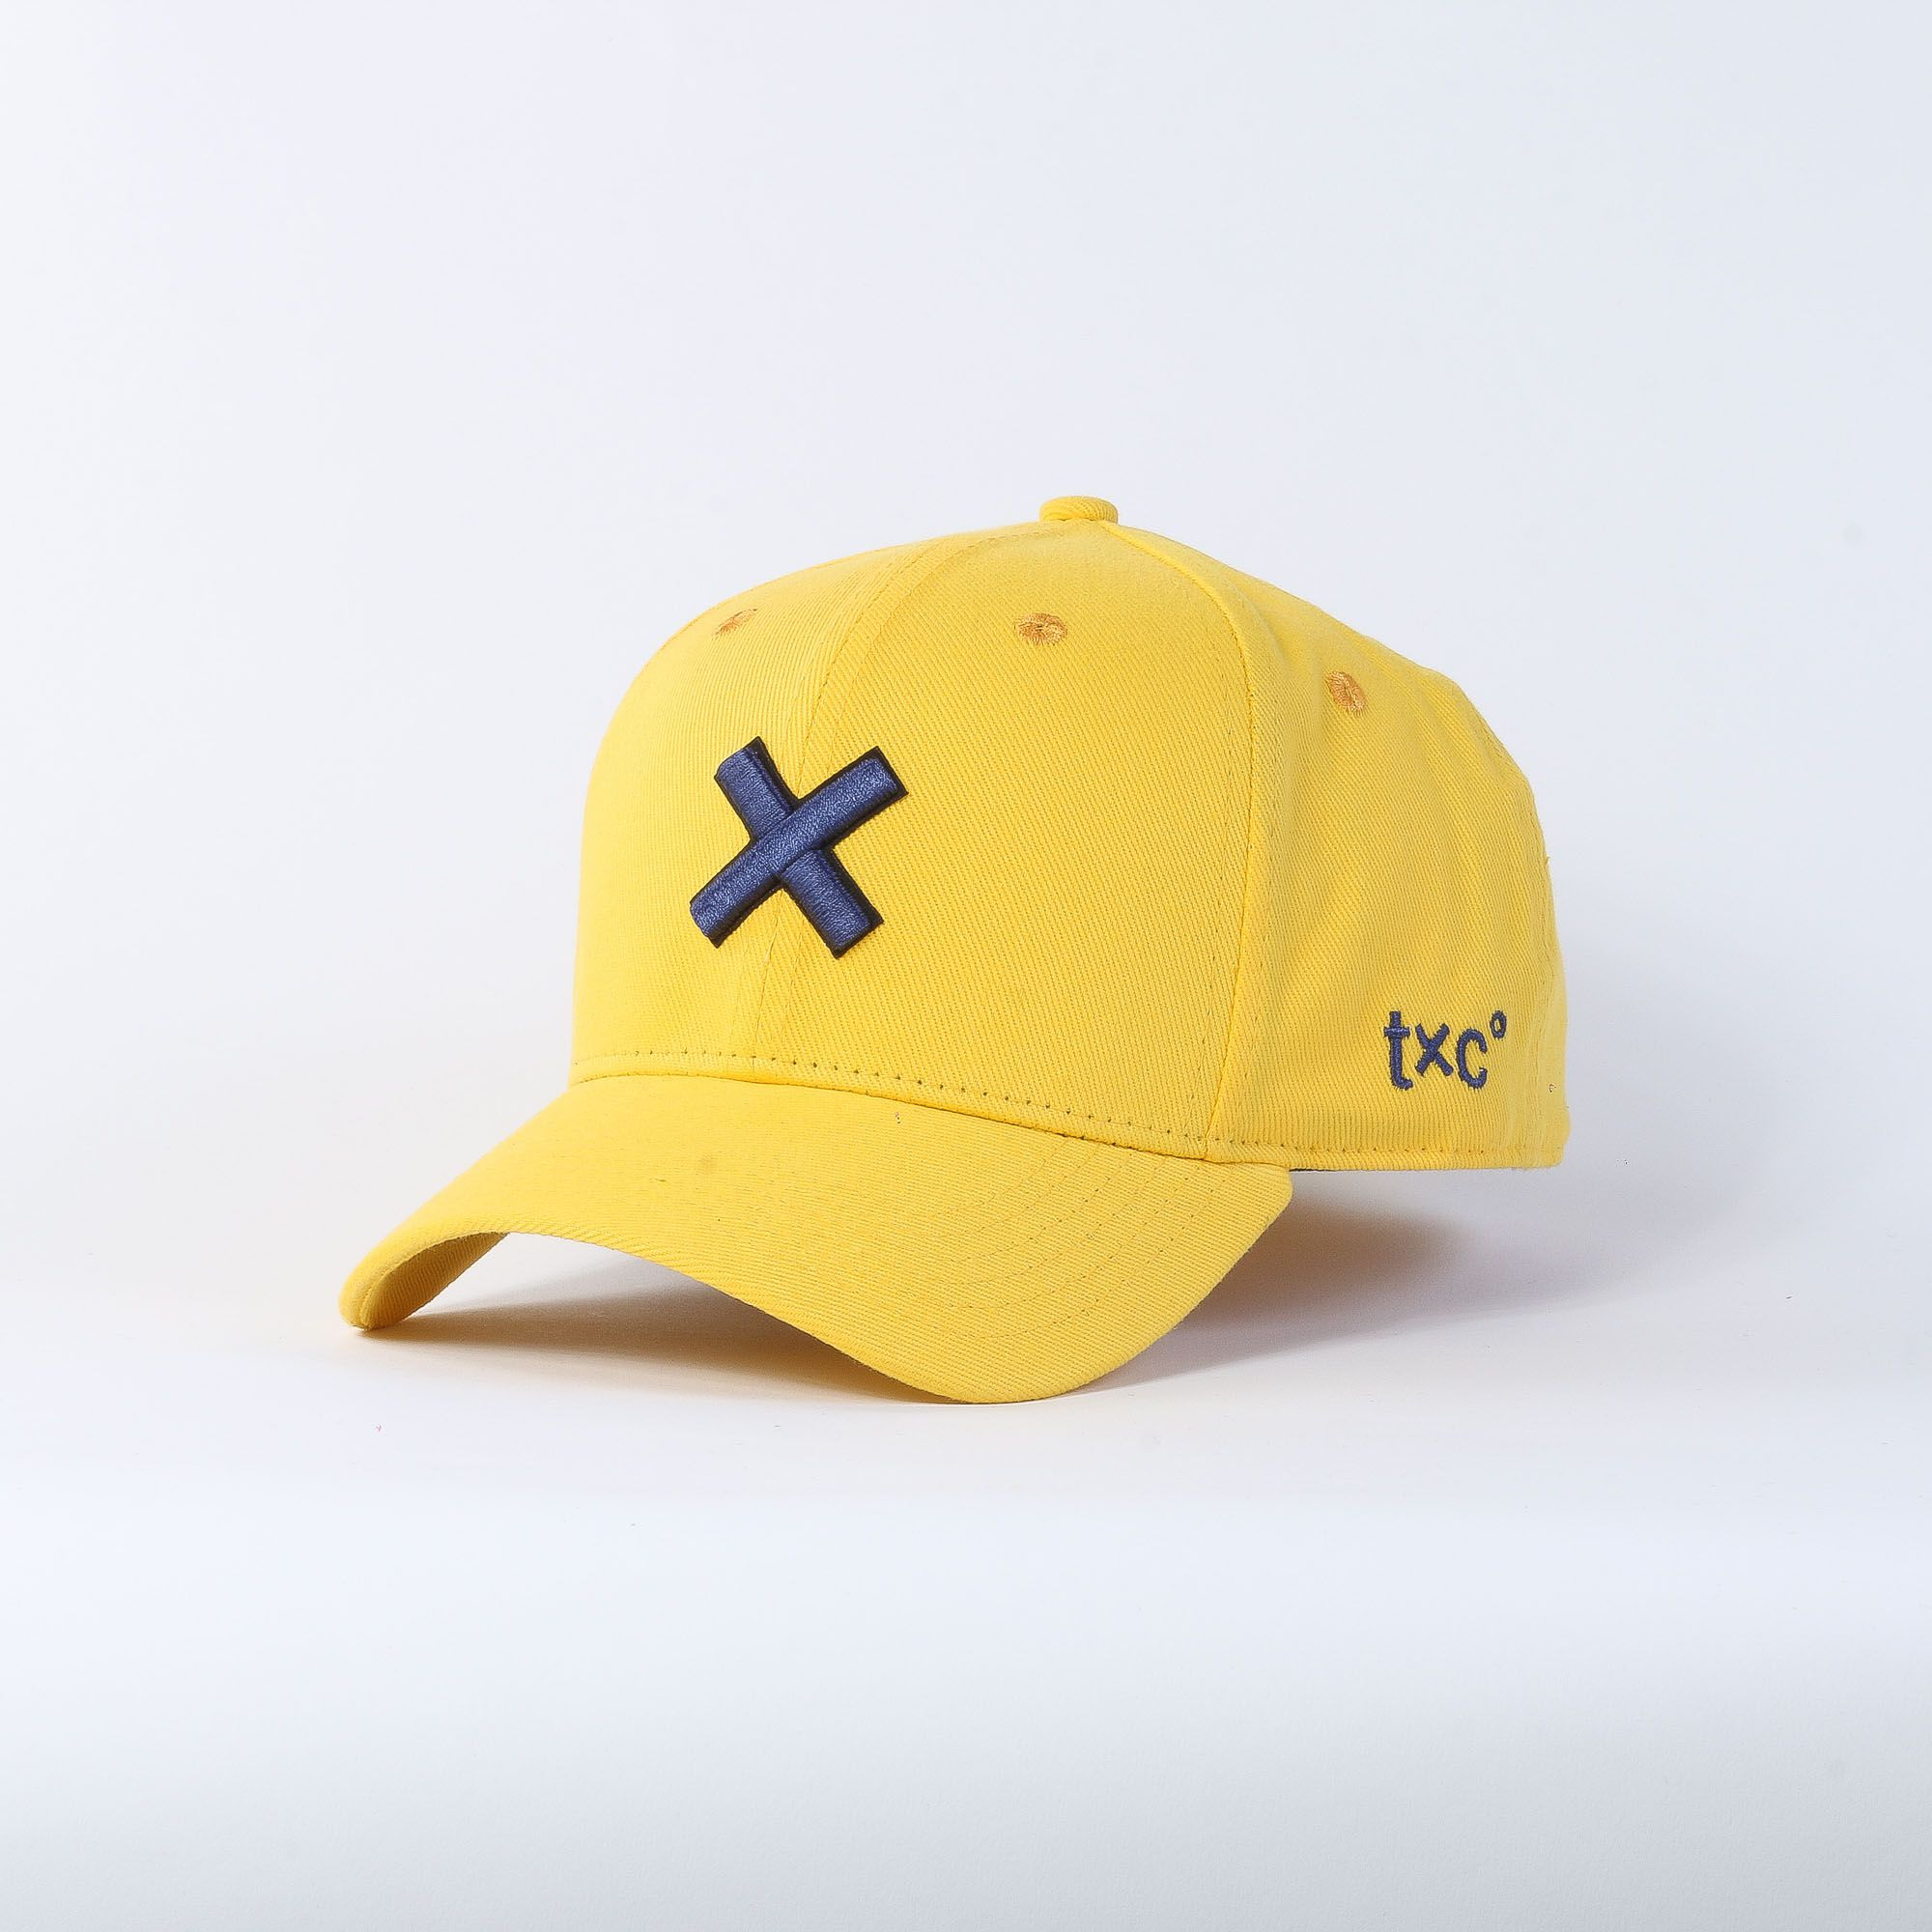 Boné TXC Brand aba curva 724C